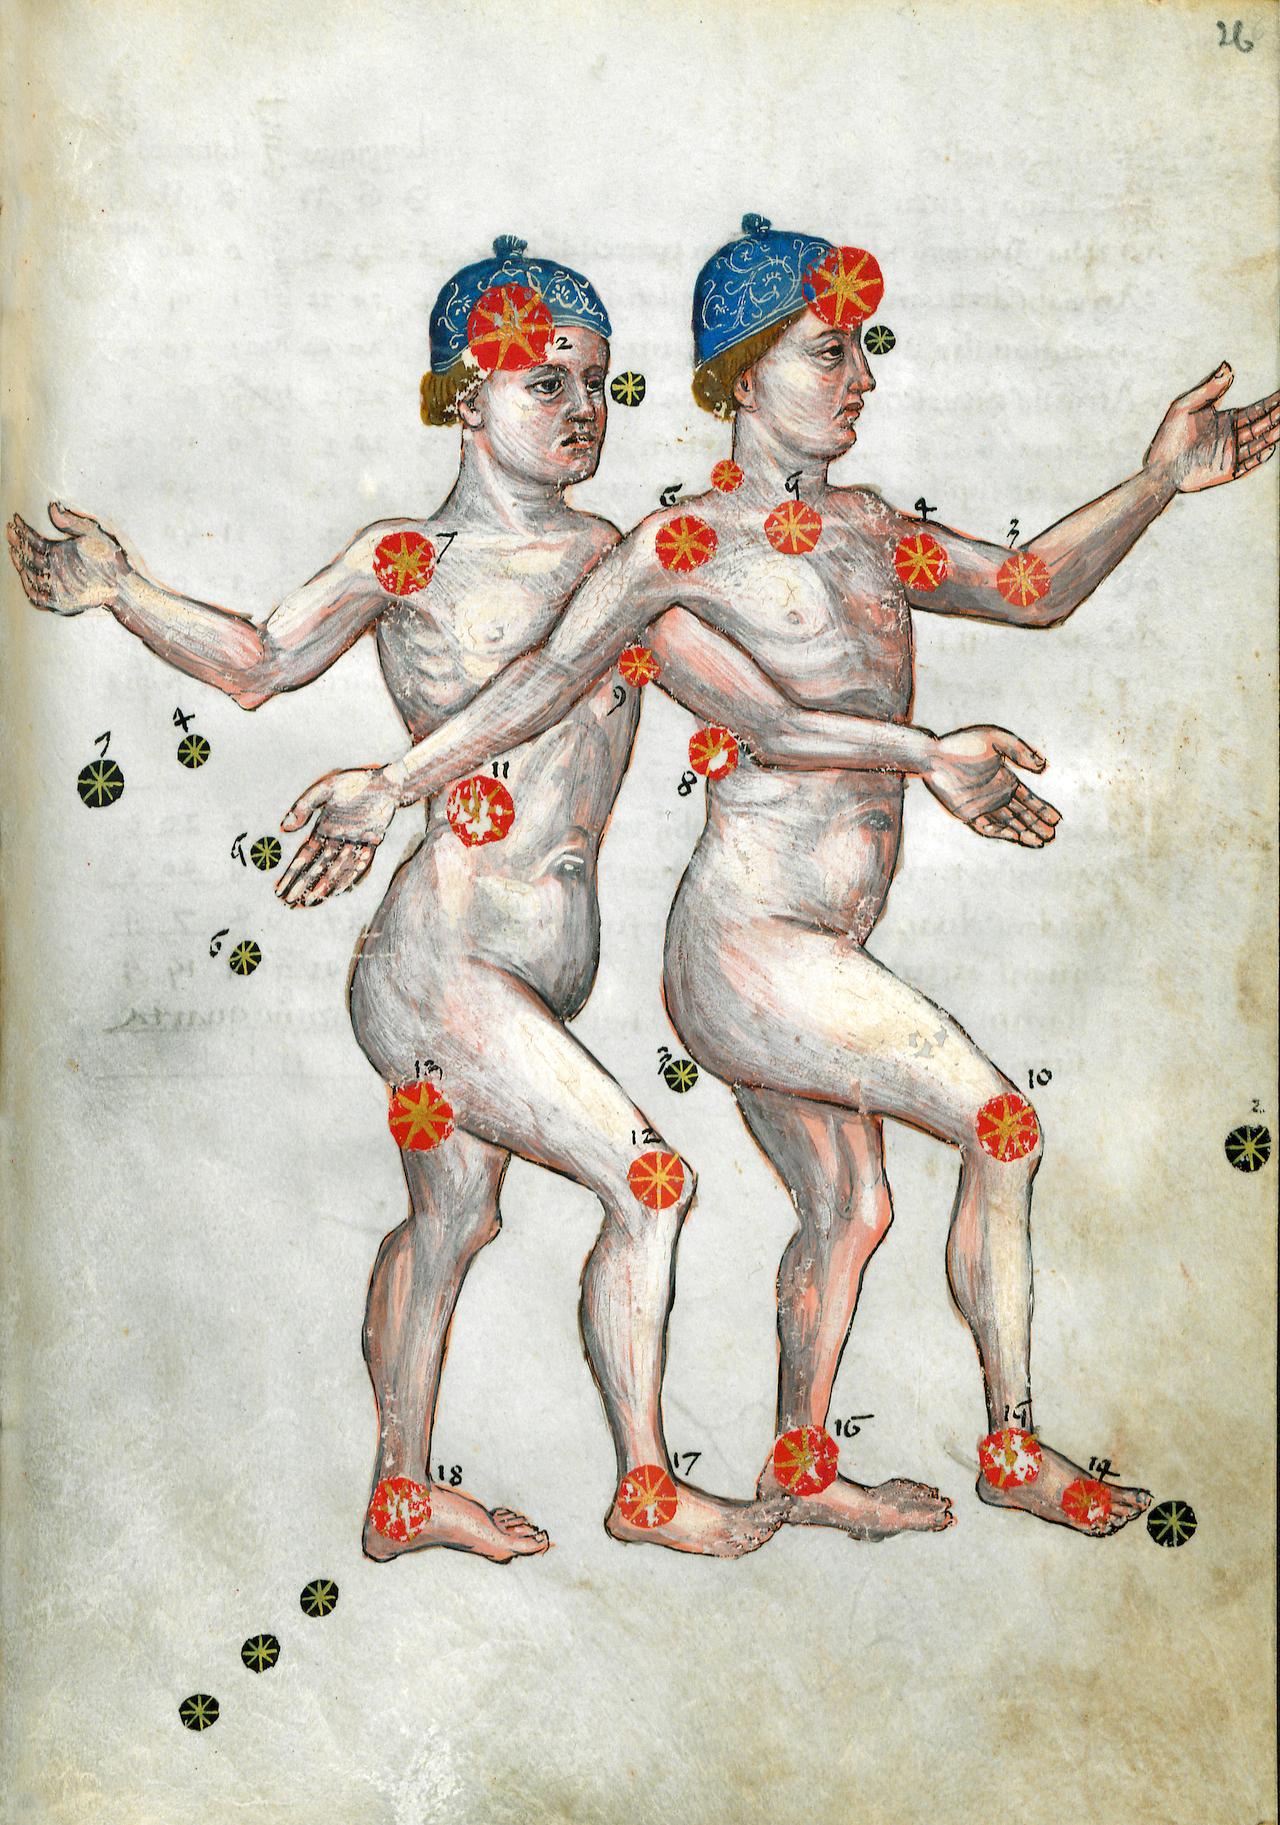 "1428 depictino of Gemini from an edition of Persian astronomer Abd al-Rahman al-Sufi's ""Book of Fixed Stars"" (Courtesy Forschungbibliothek Gotha)"